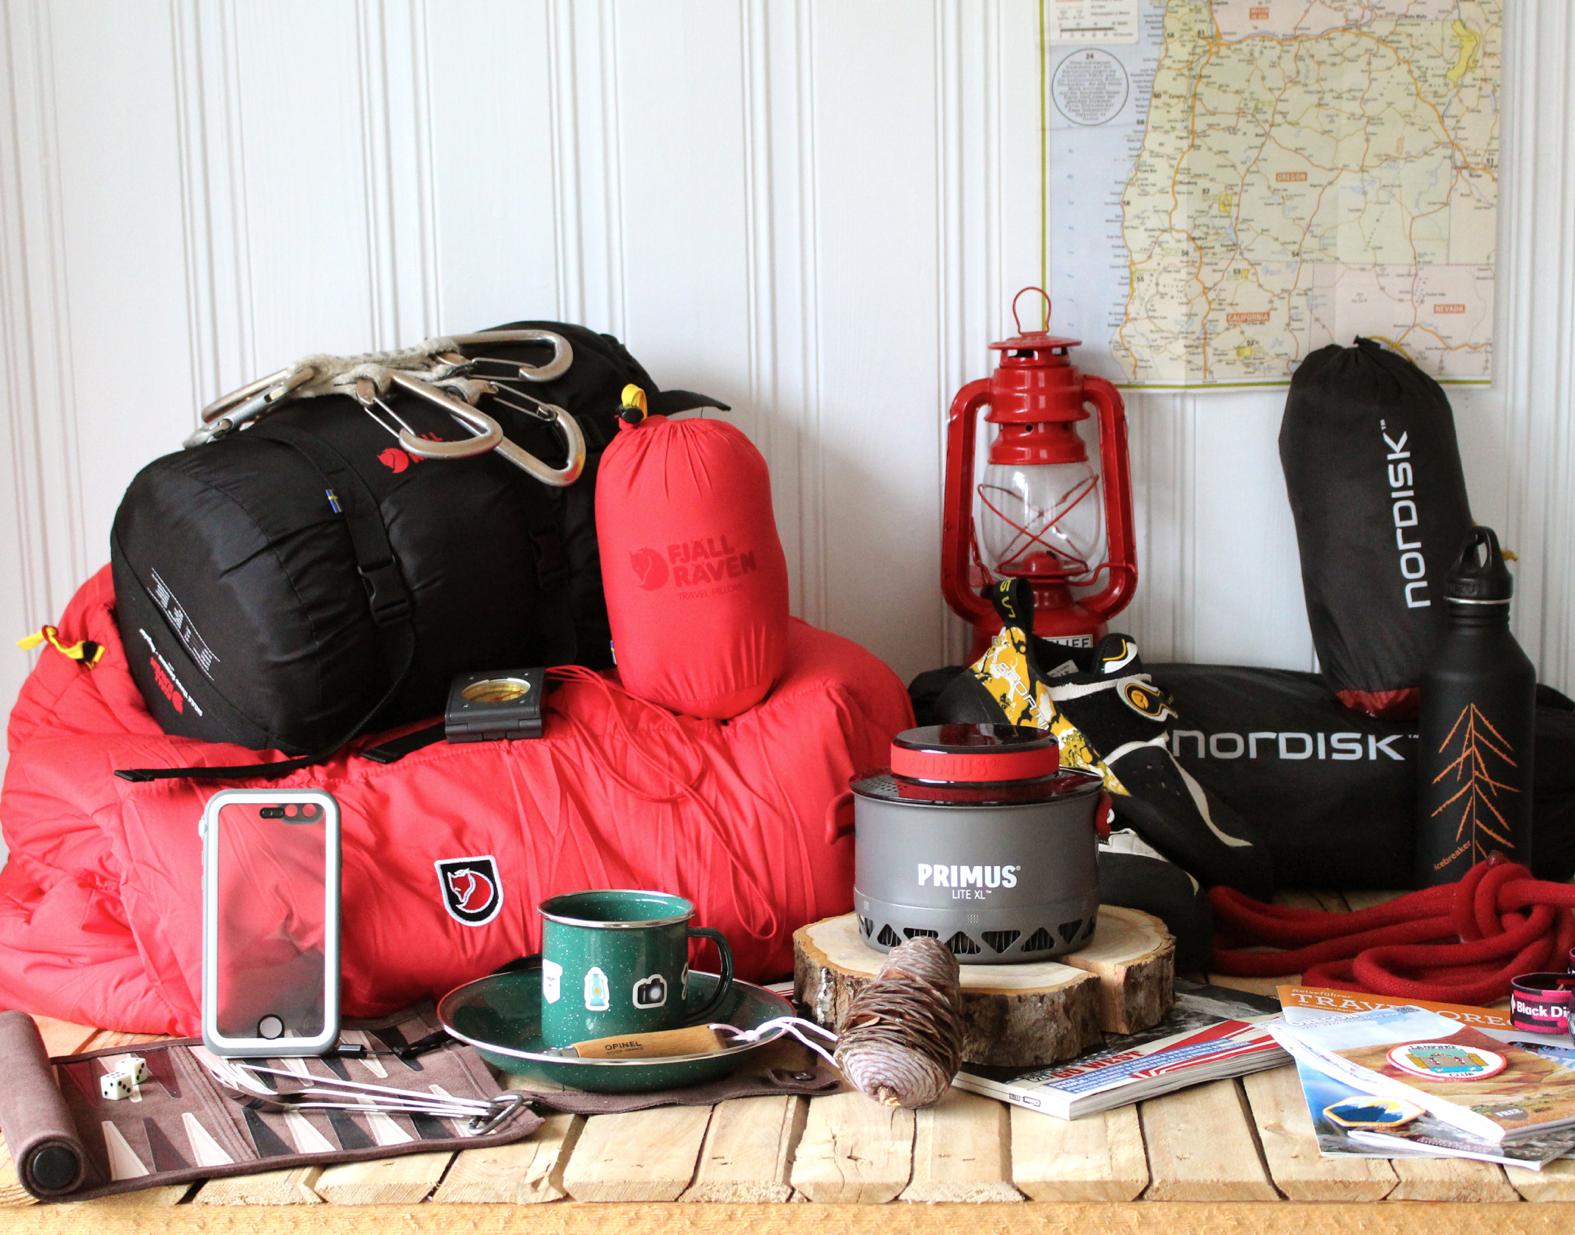 maybeyoulike_packlist_oregon_camping10